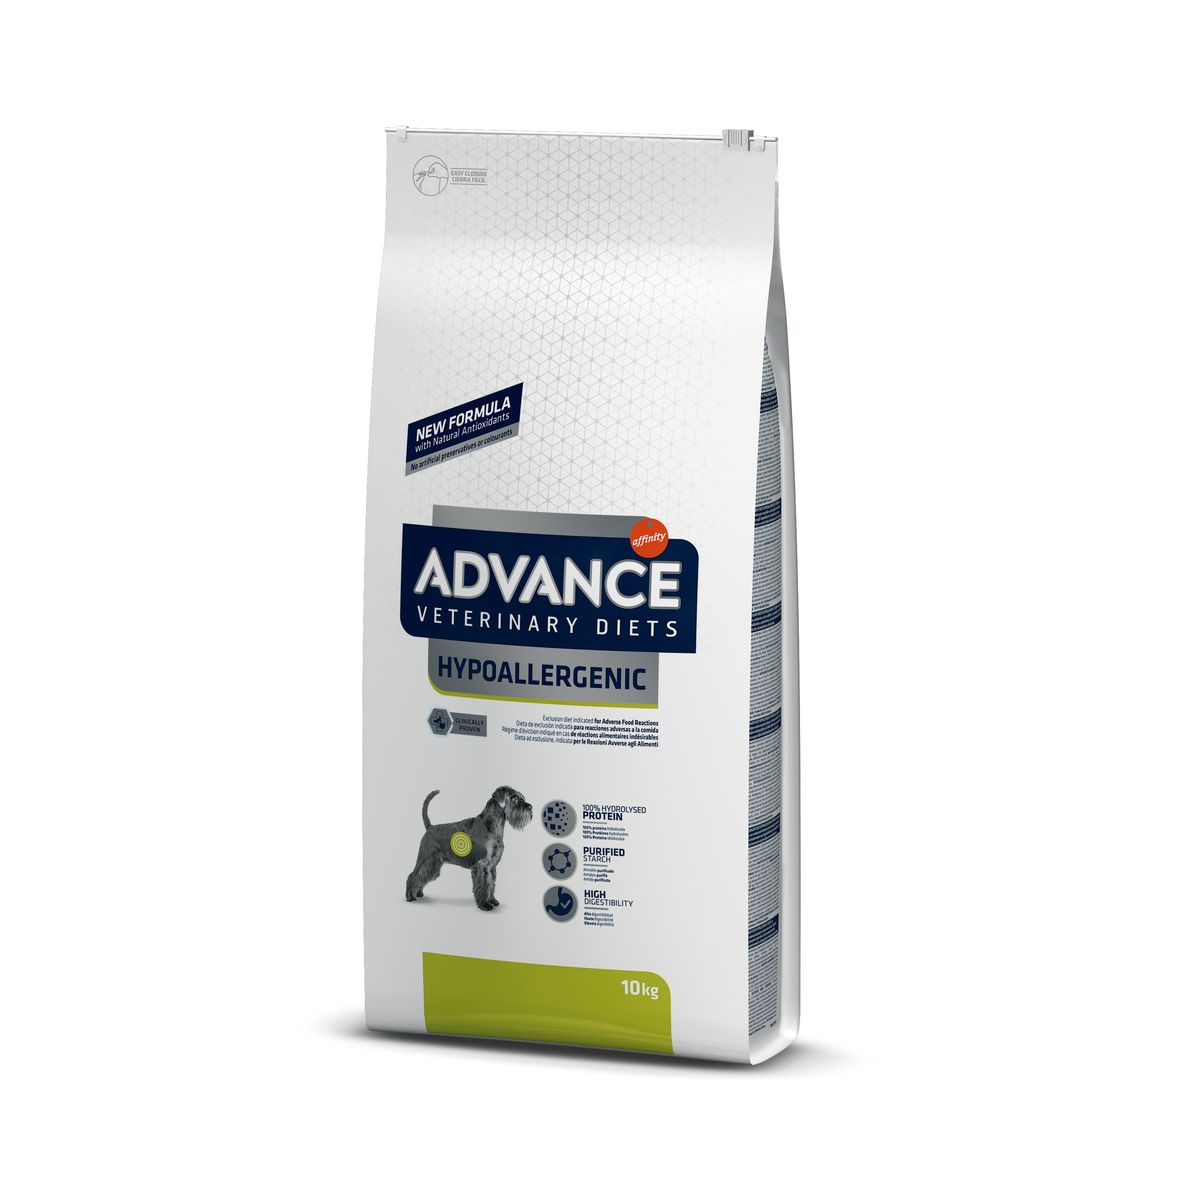 Advance Hypoallergenic formula 10kg.